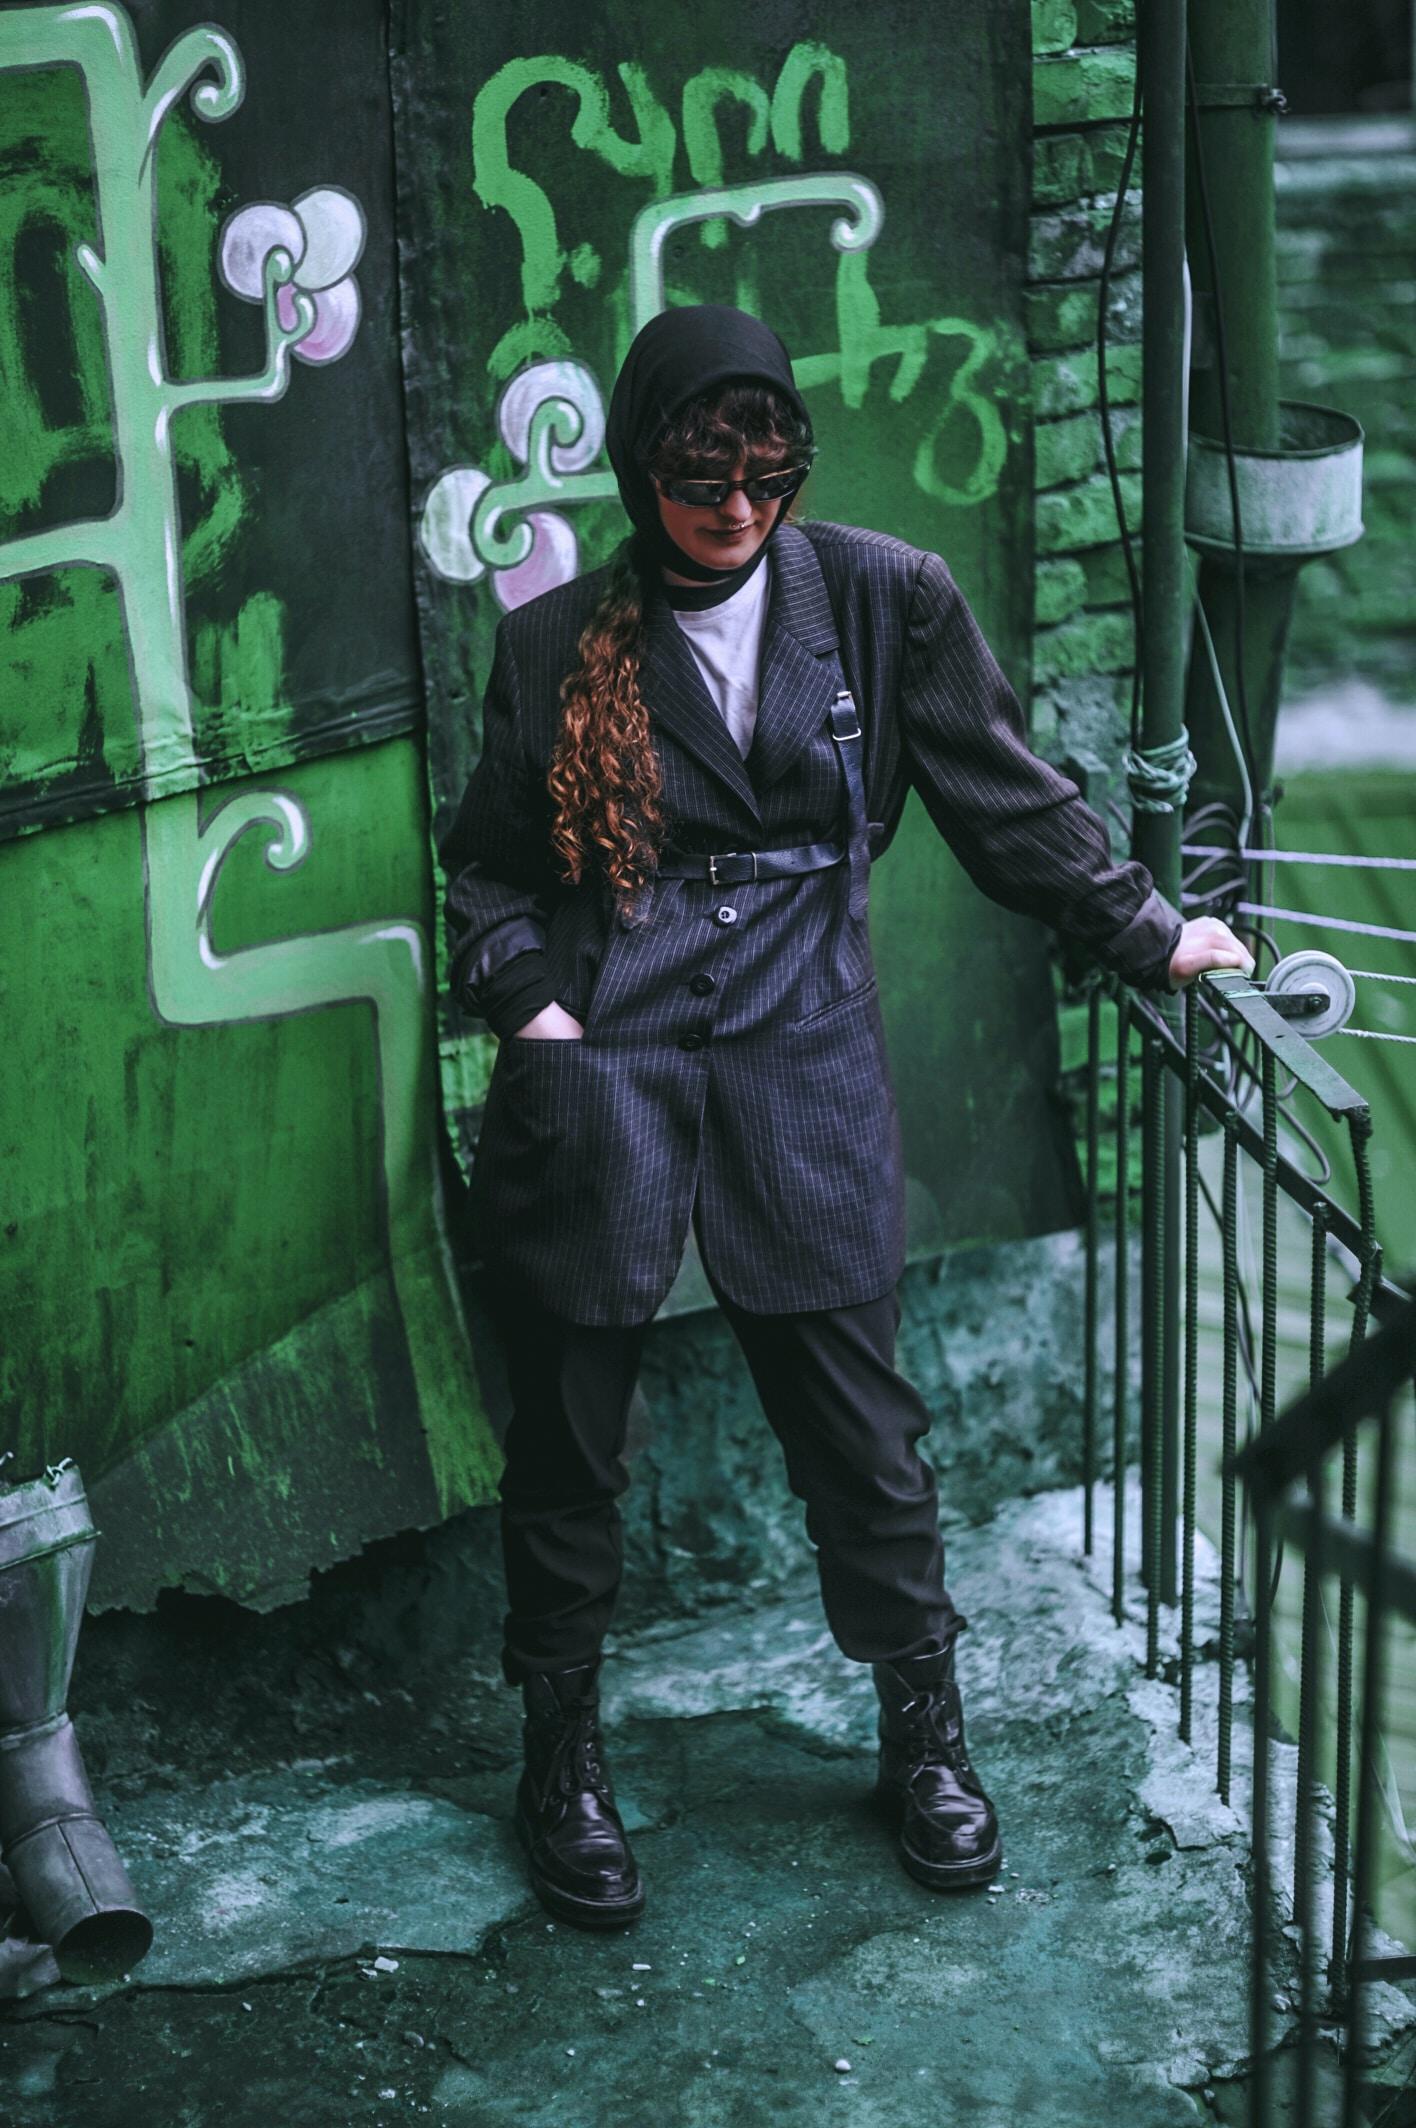 woman standing on corner holding metal rail